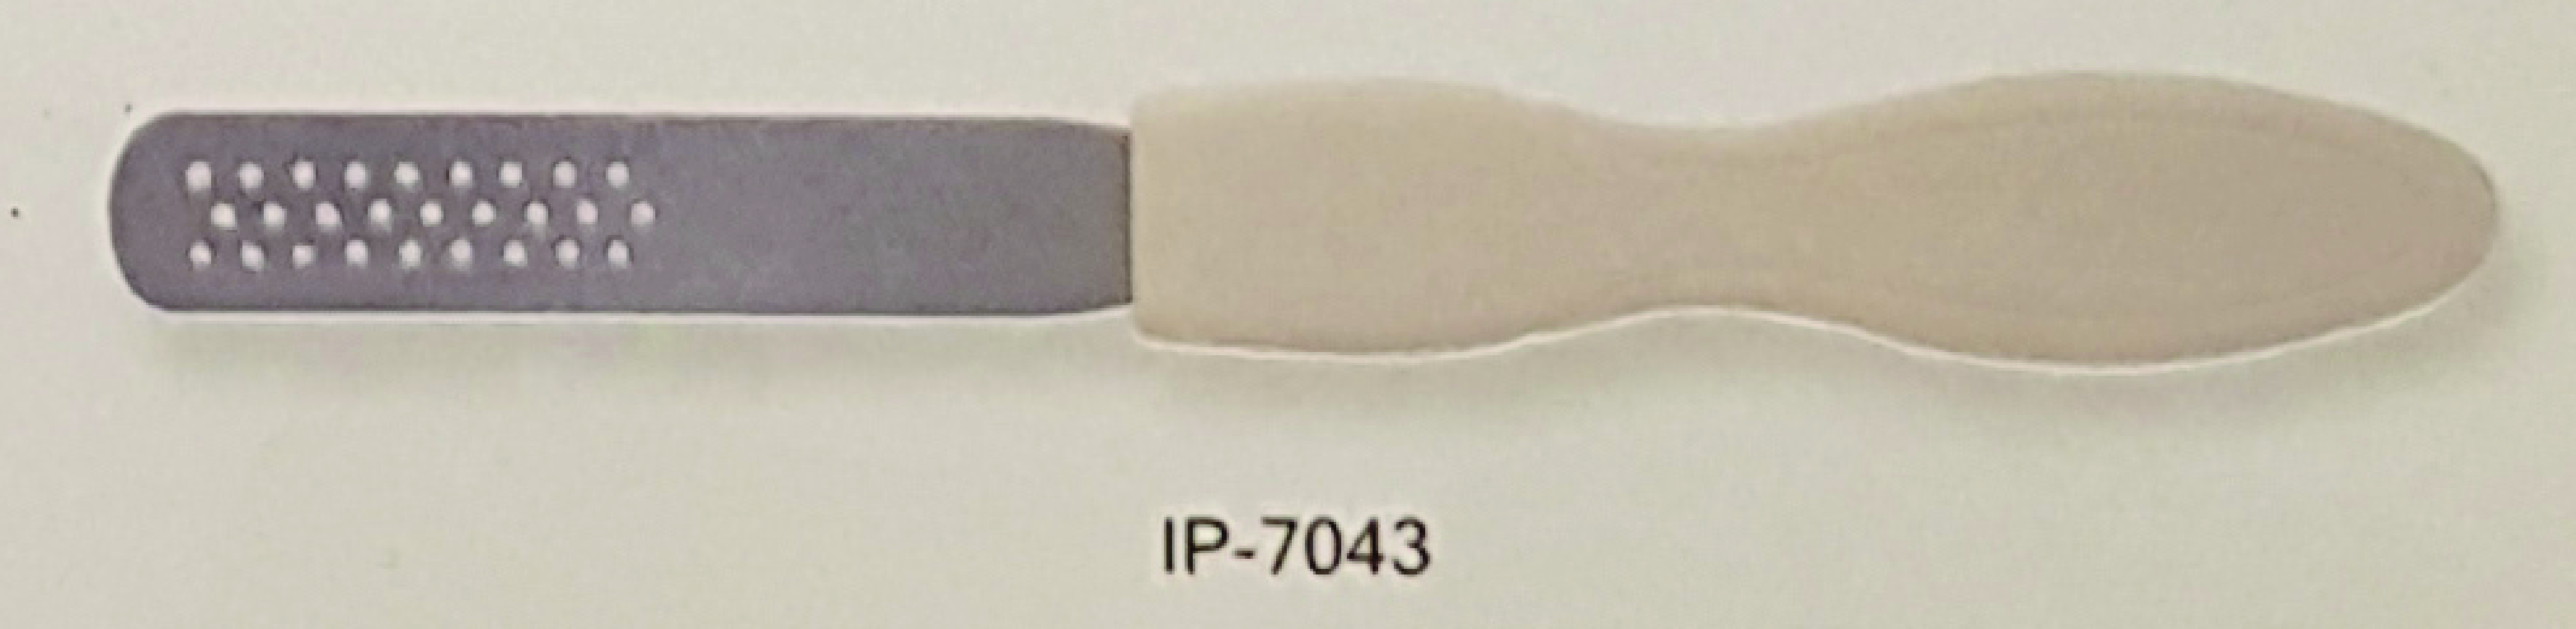 IP-7043